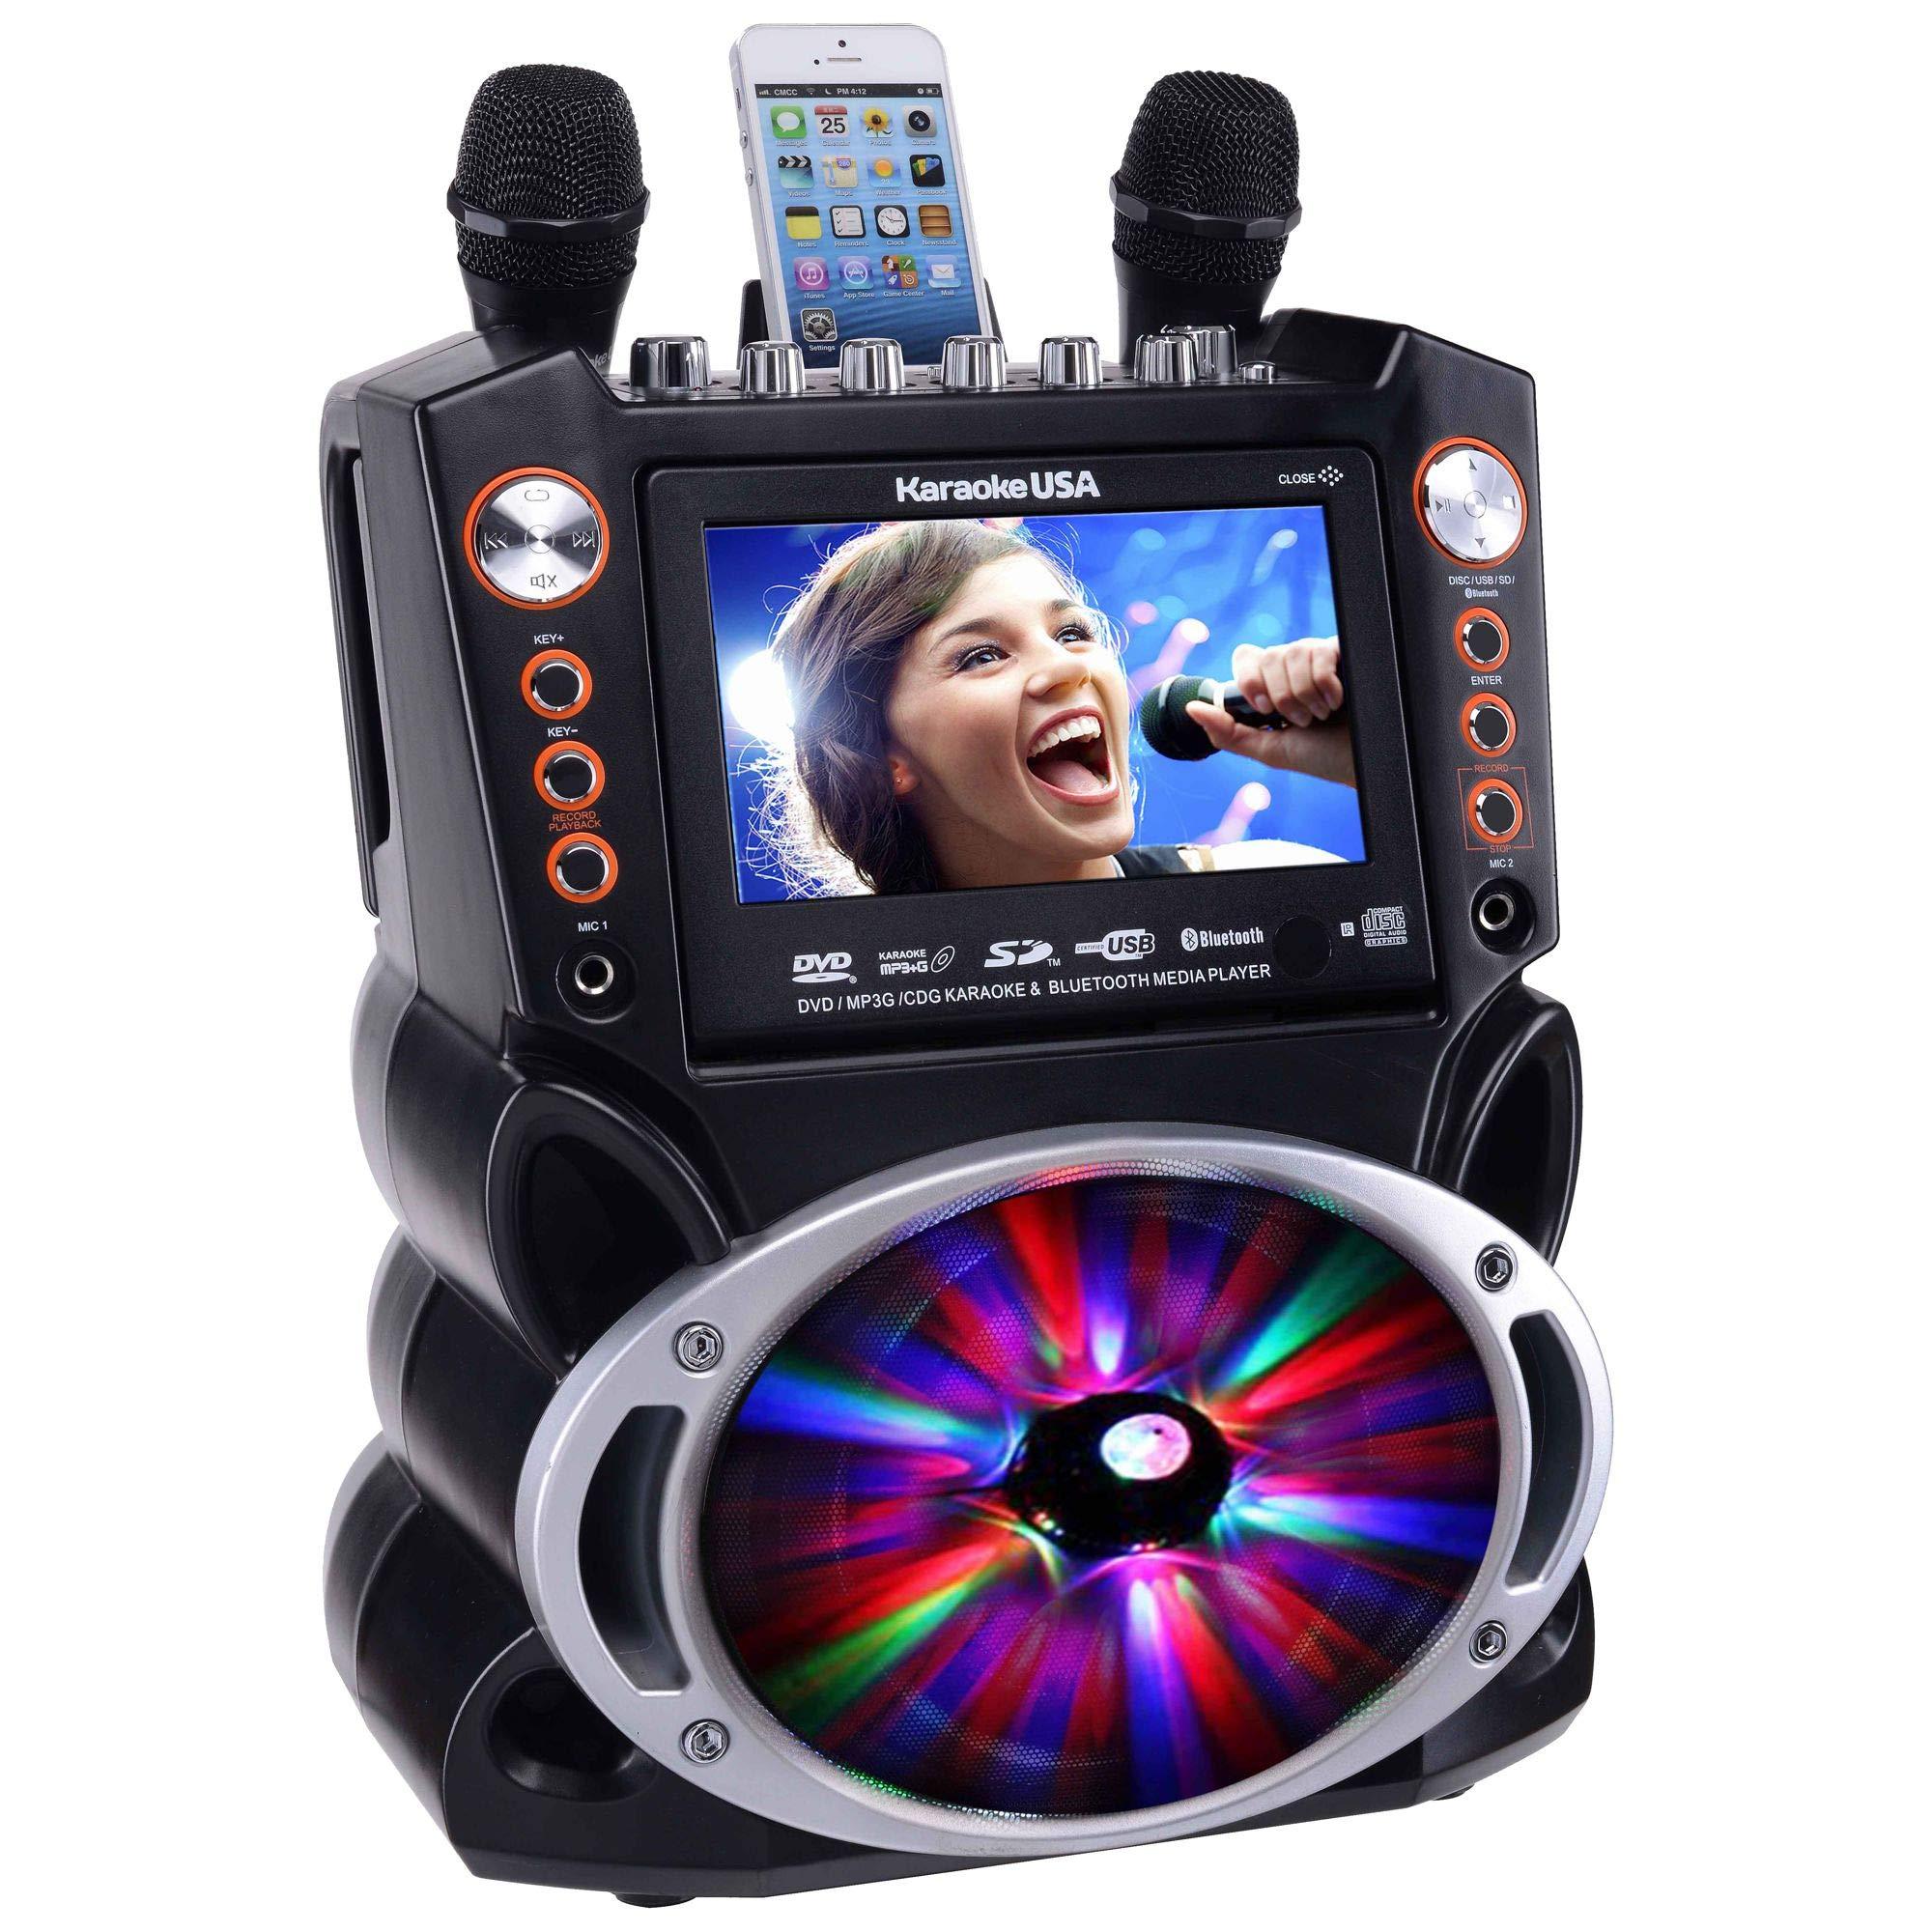 Karaoke USA GF846 DVD/CDG/MP3G Karaoke Machine with 7'' TFT Color Screen, Record, Bluetooth and LED Sync Lights by Karaoke USA (Image #14)